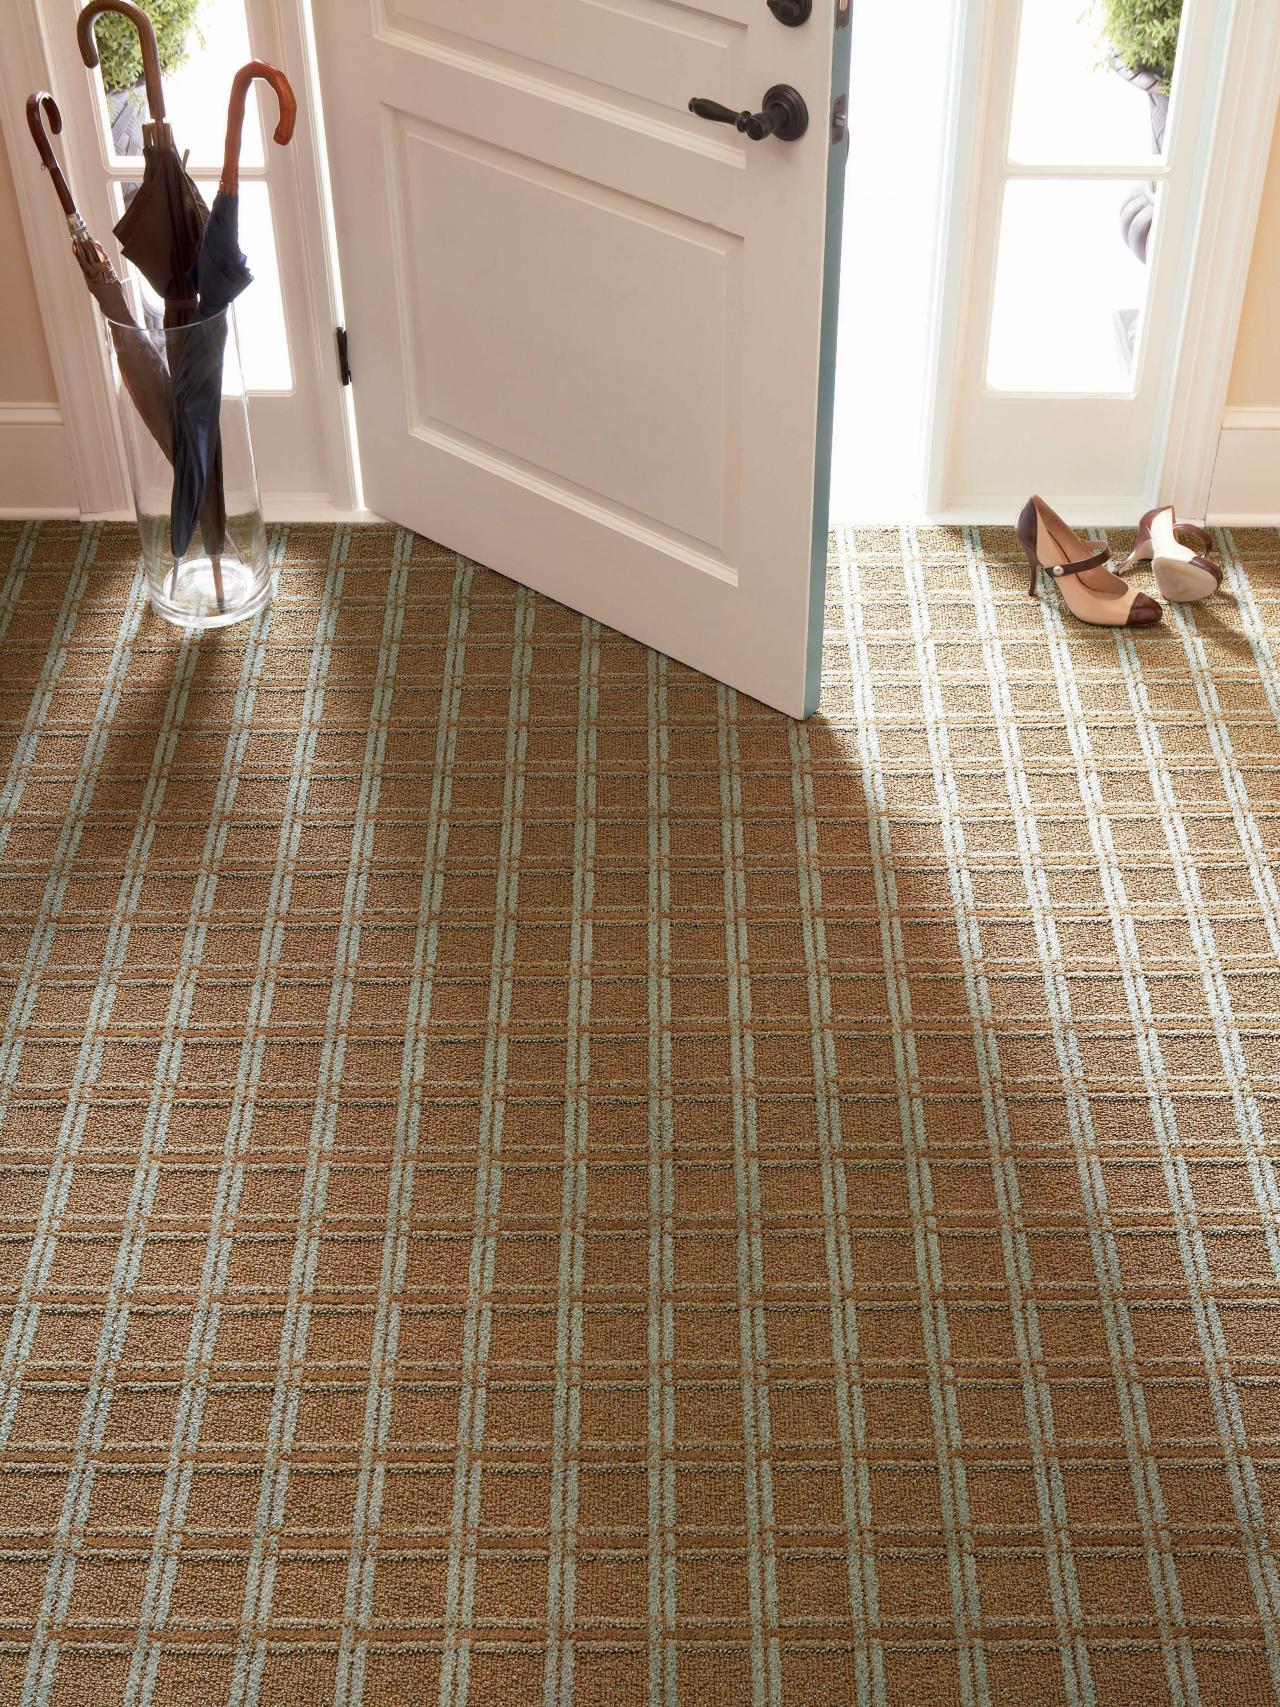 Simple Carpet-Maintenance Steps   DIY